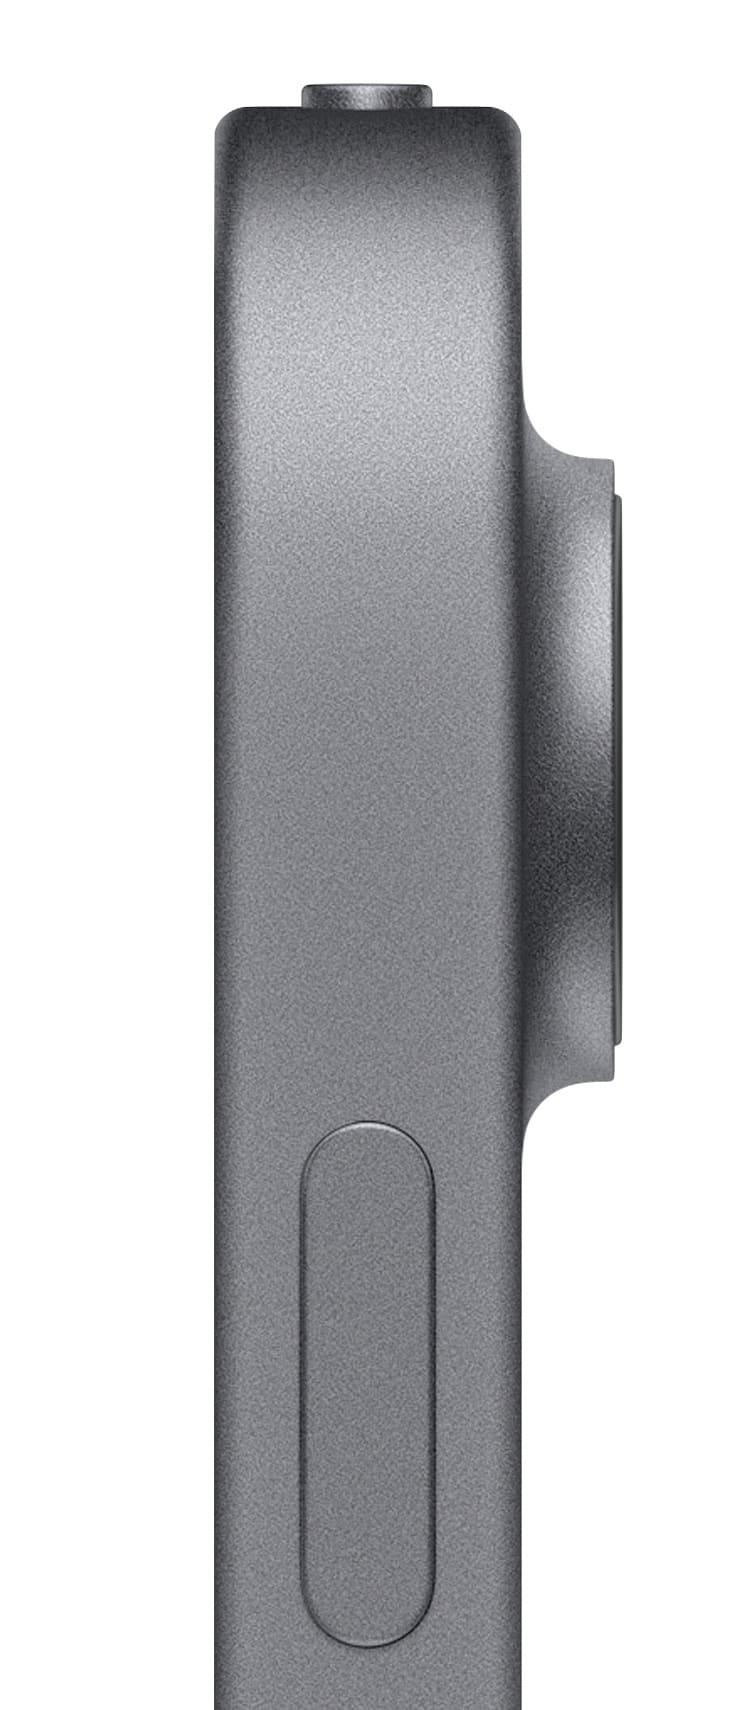 Камера iPad Pro